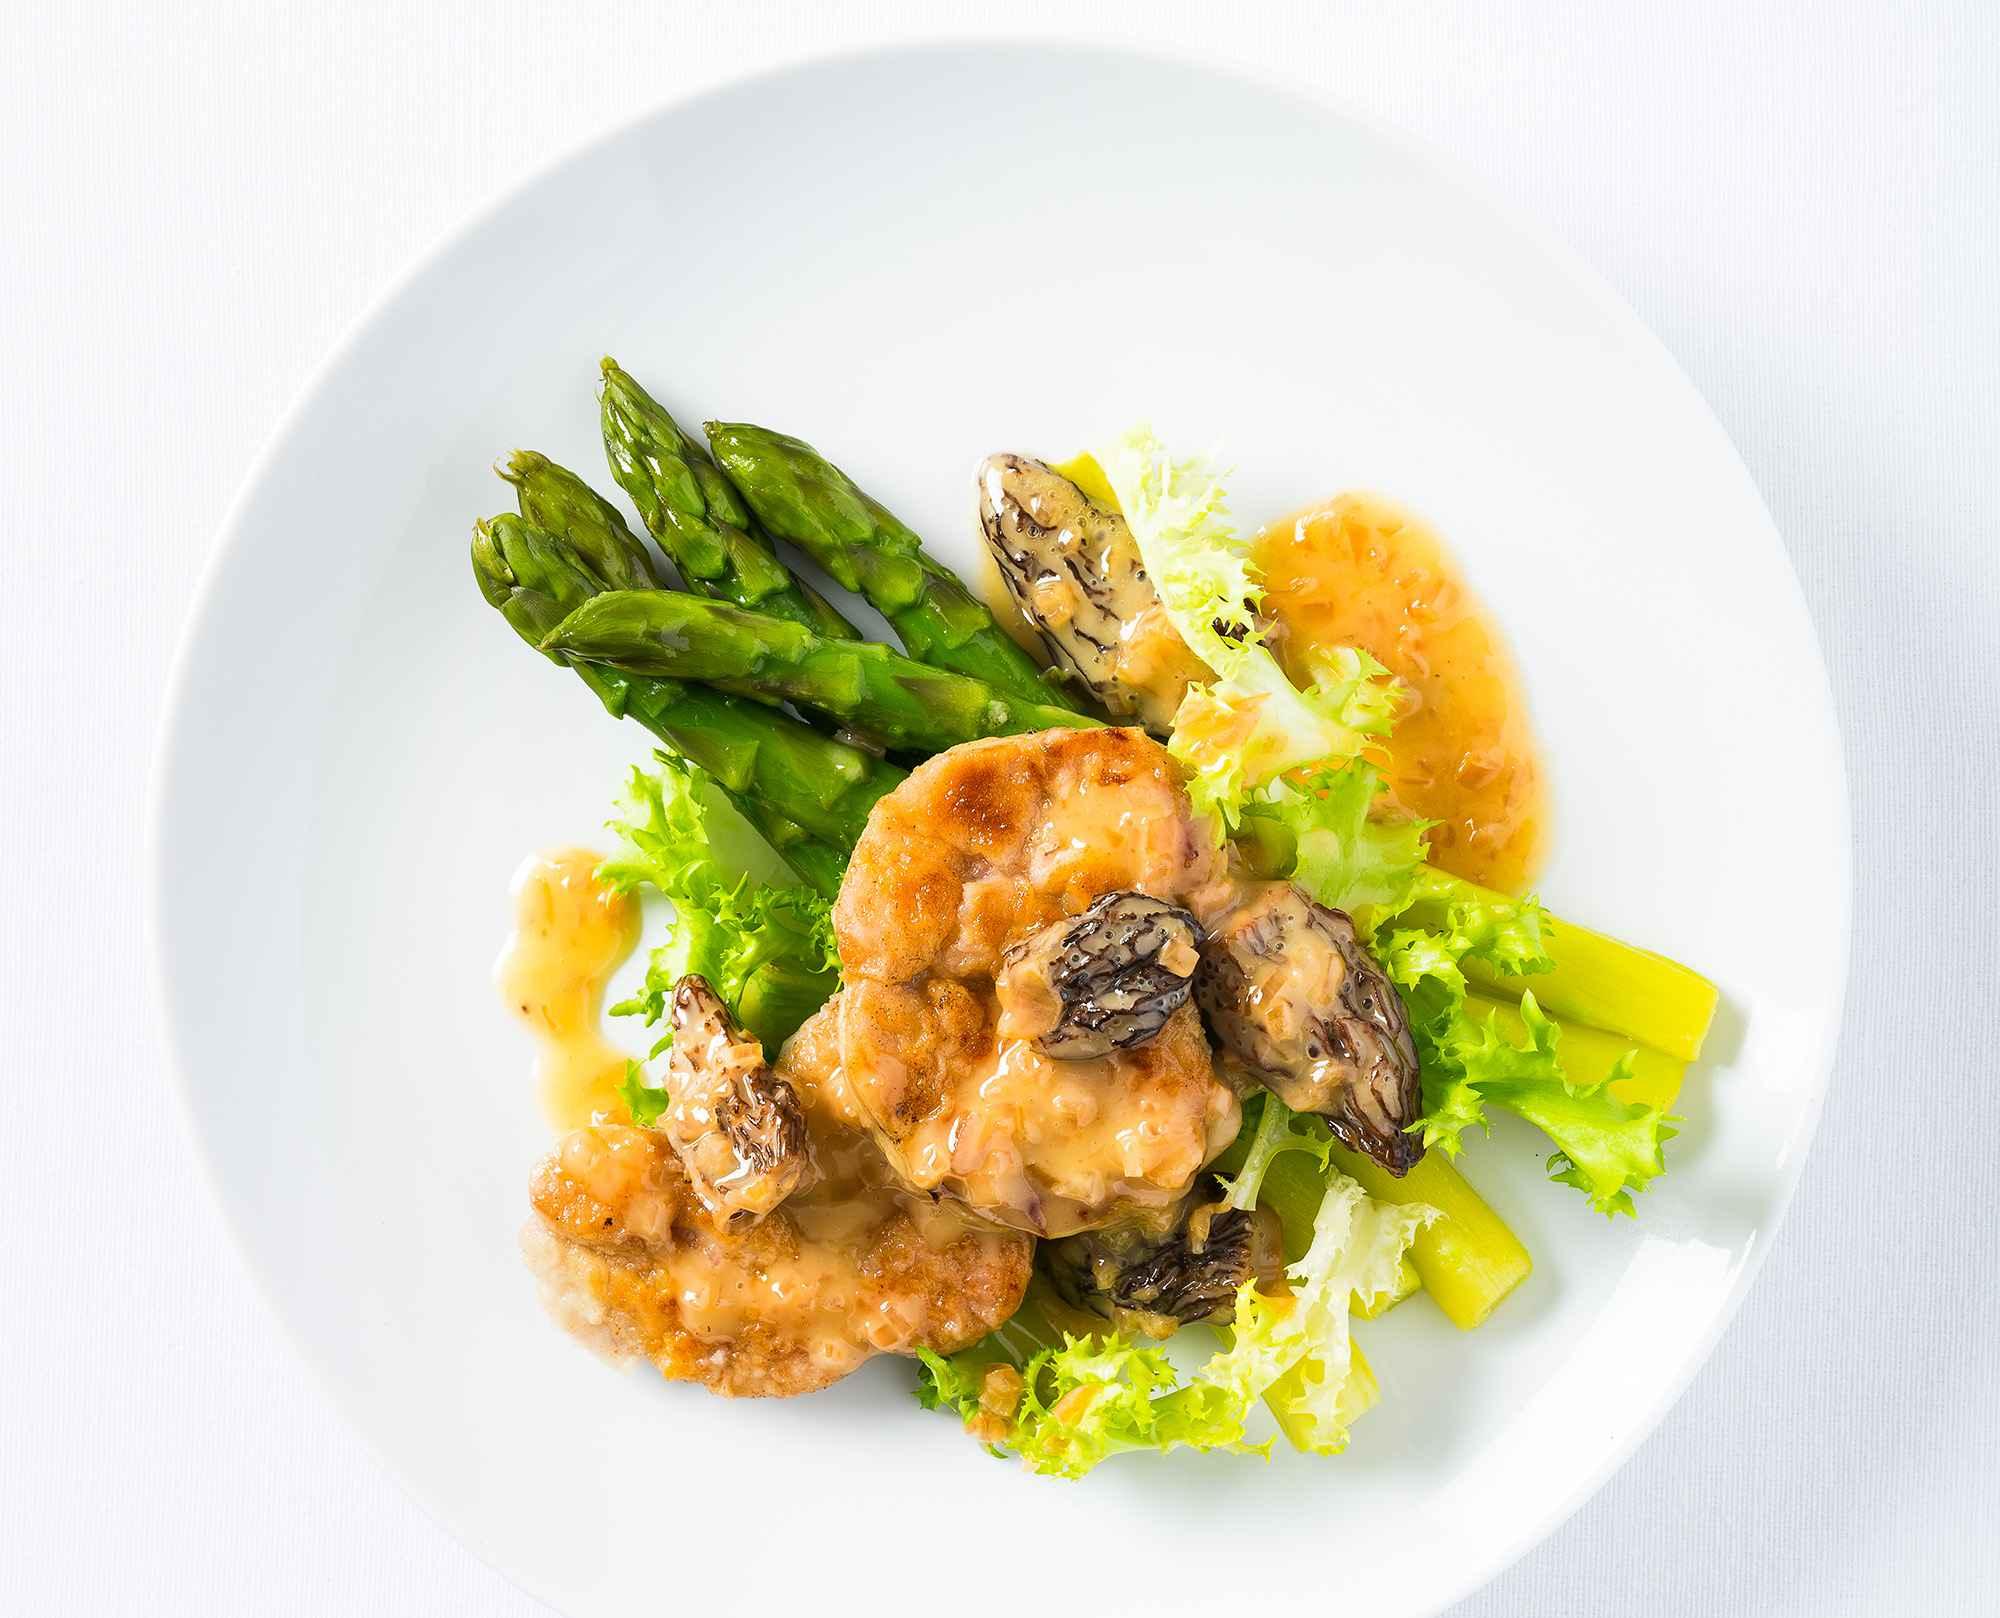 Gebratene Kalbsbries-Schnitzel mit Morchel-Beurre-Blanc